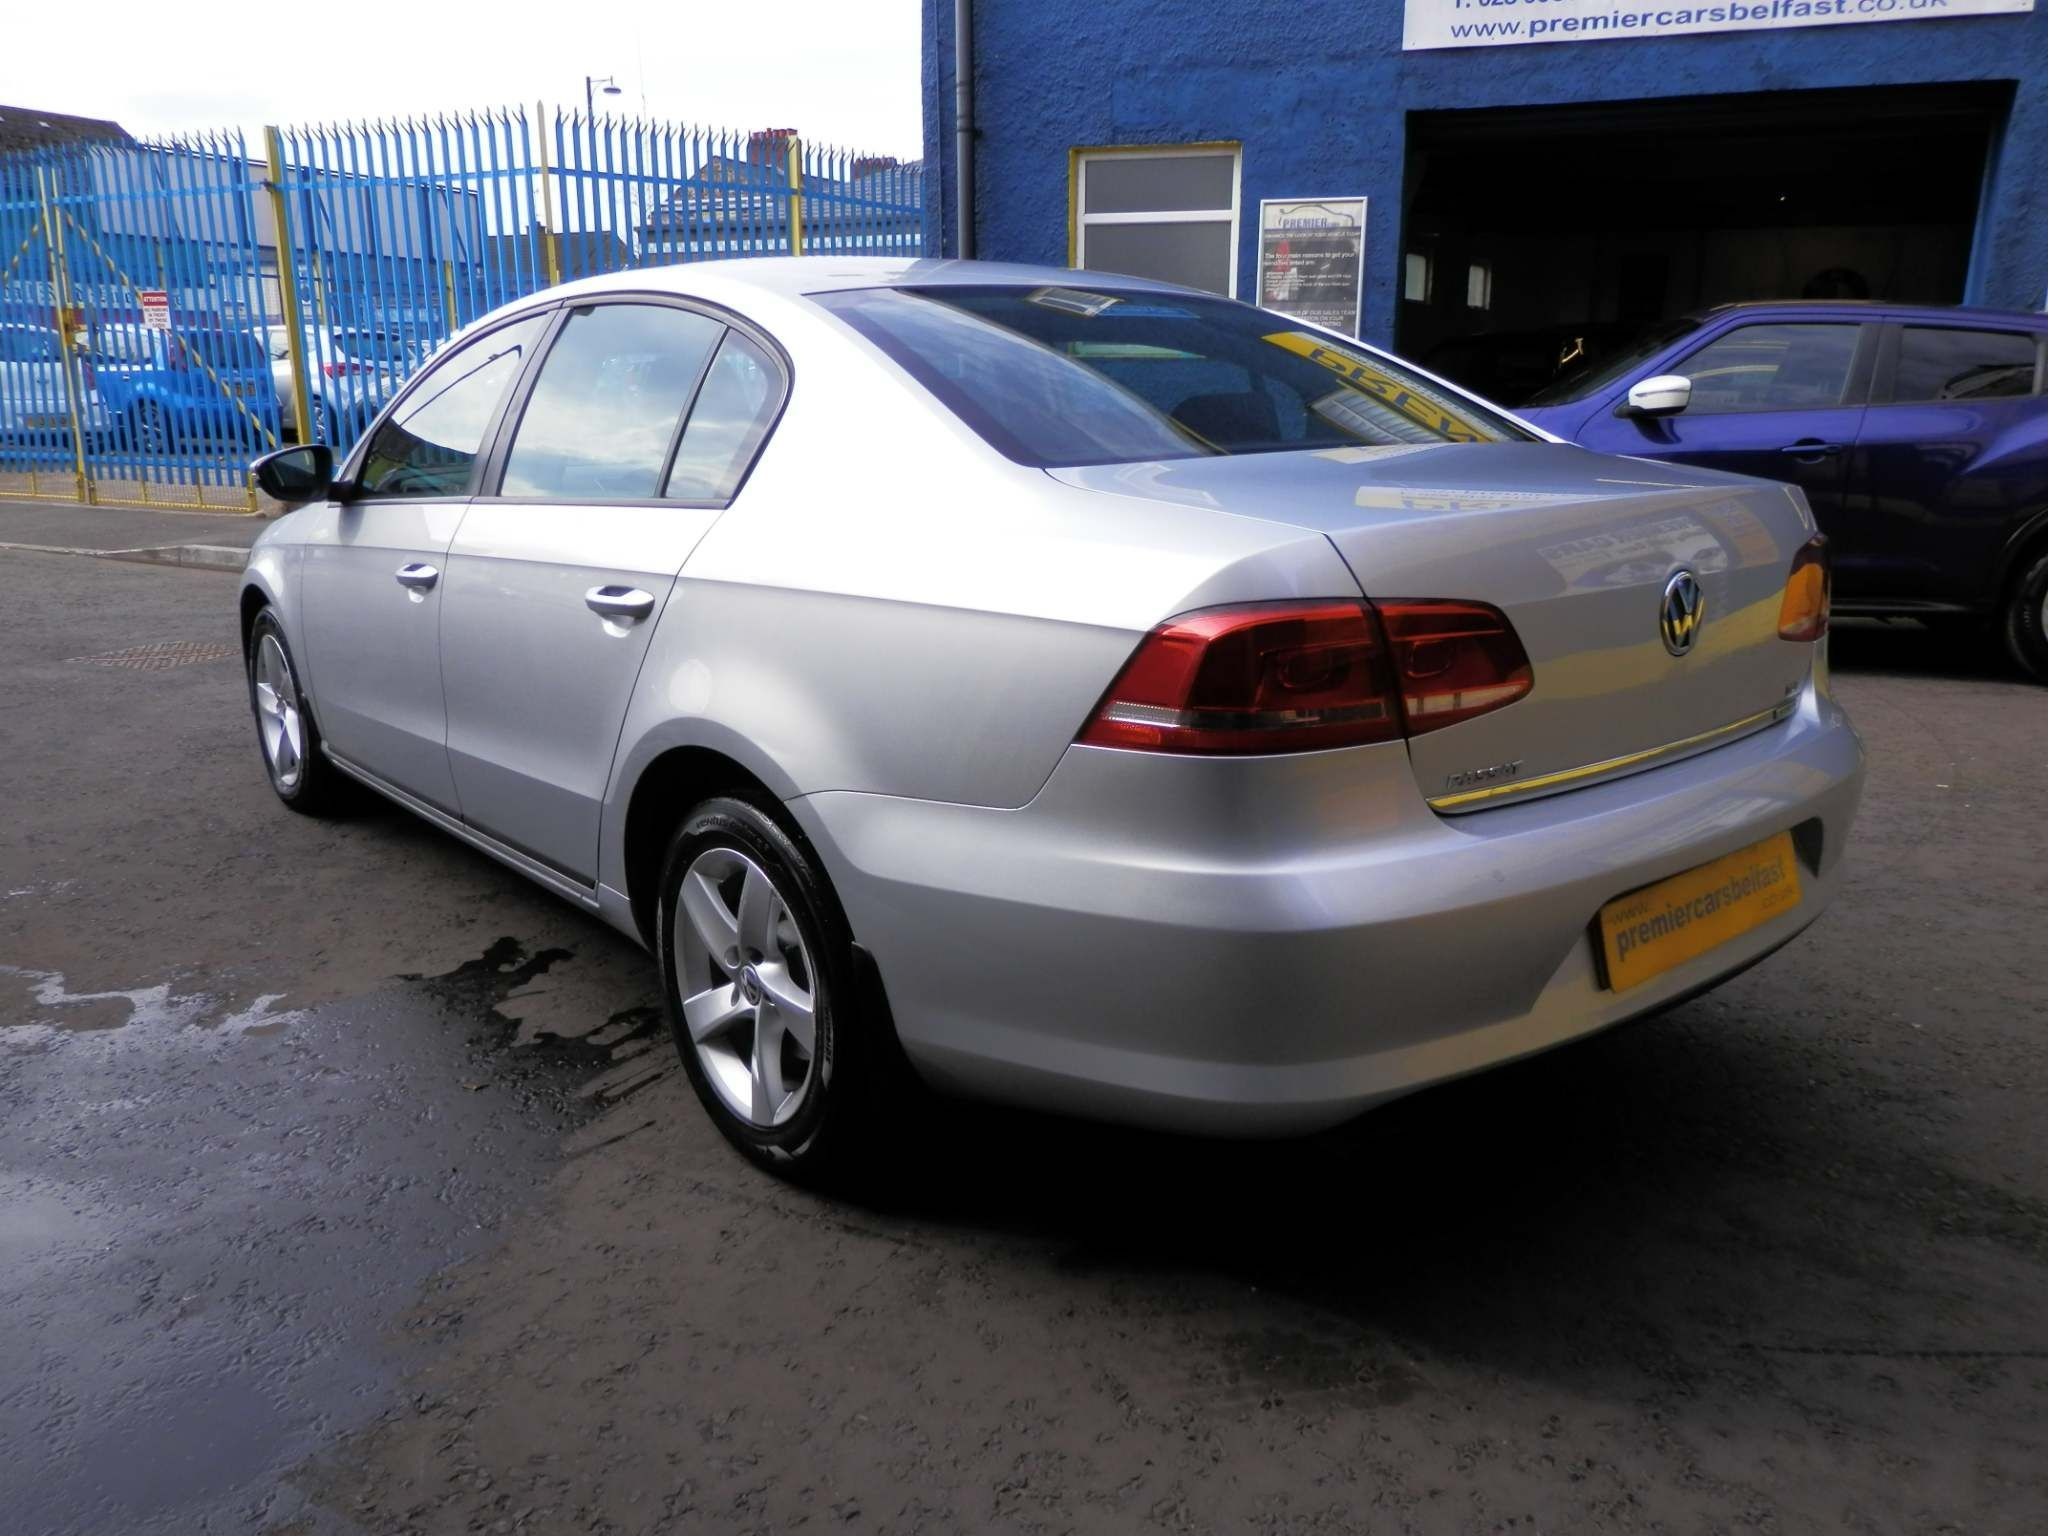 2012 VOLKSWAGEN Passat 1.6 TDI BlueMotion Tech S (s/s) Diesel Manual  – Premier Cars Belfast Belfast full